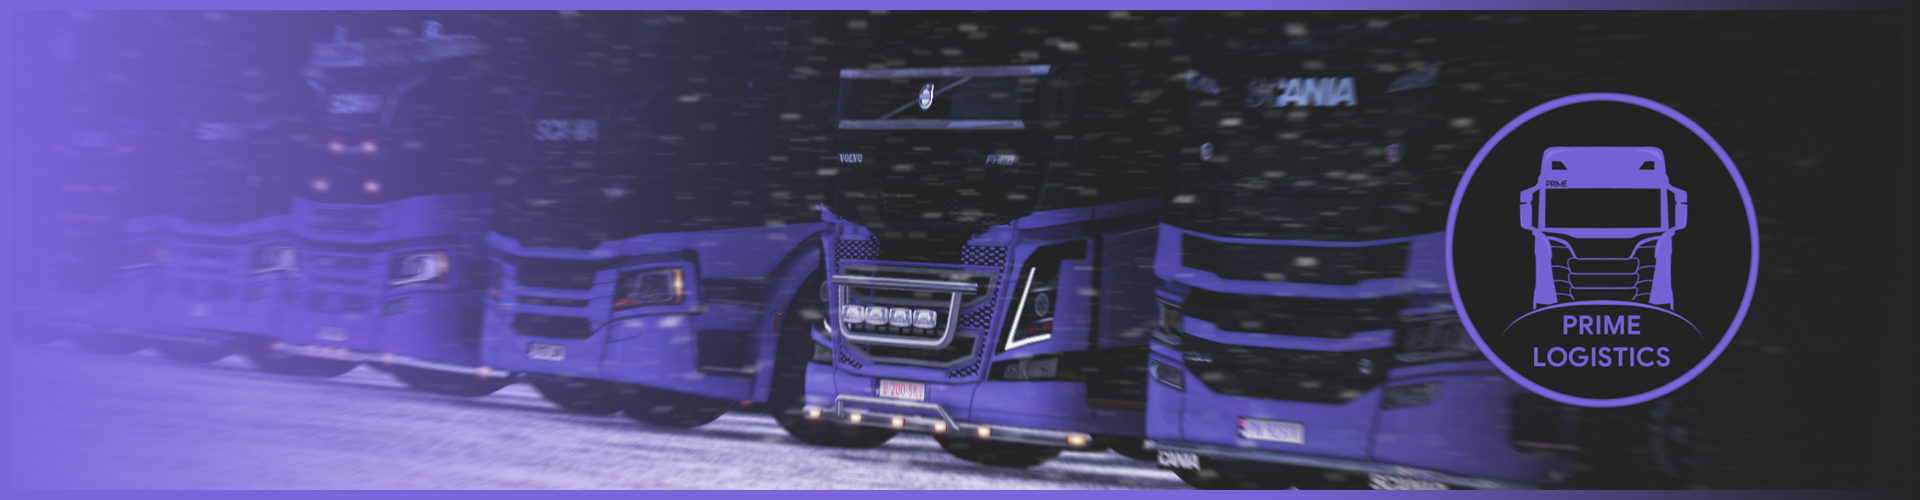 🟣 Prime Logistics Convoy #77